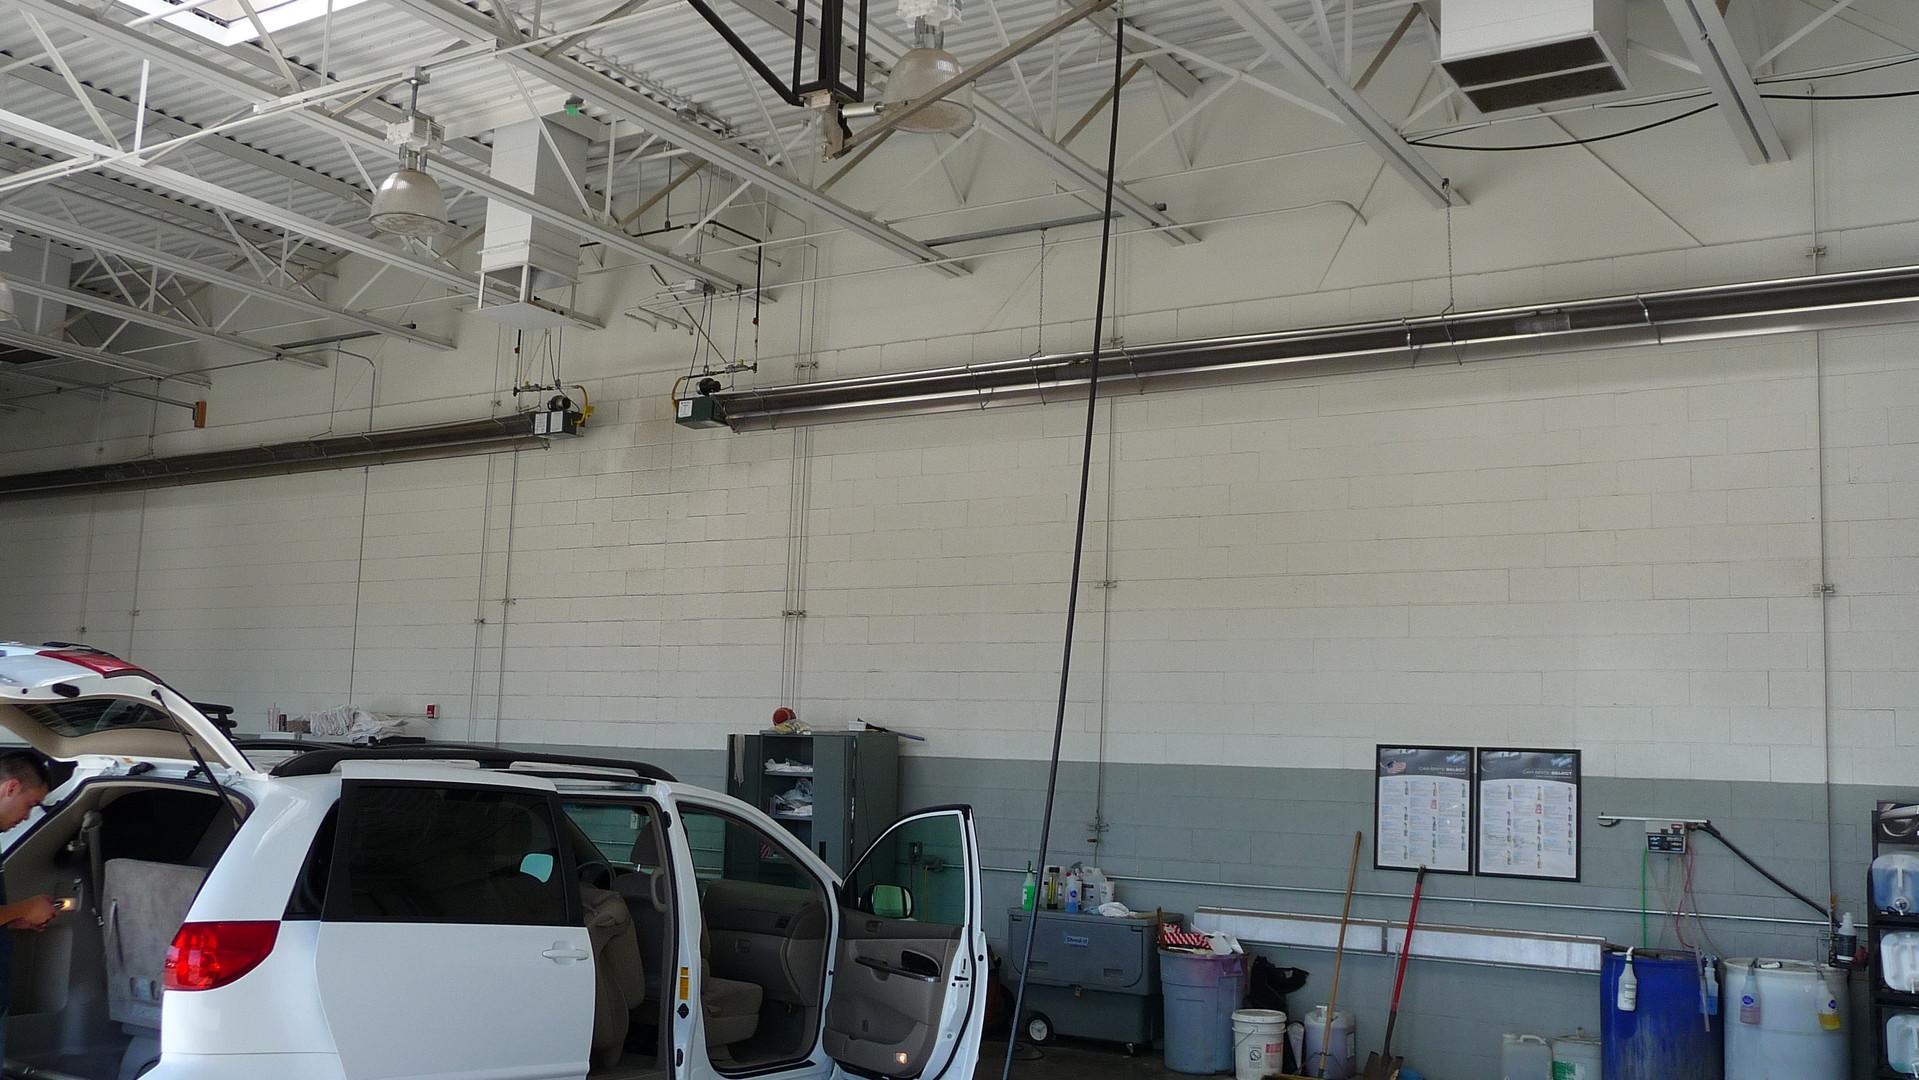 Auto detail bay with tube heater reflectors turned inward